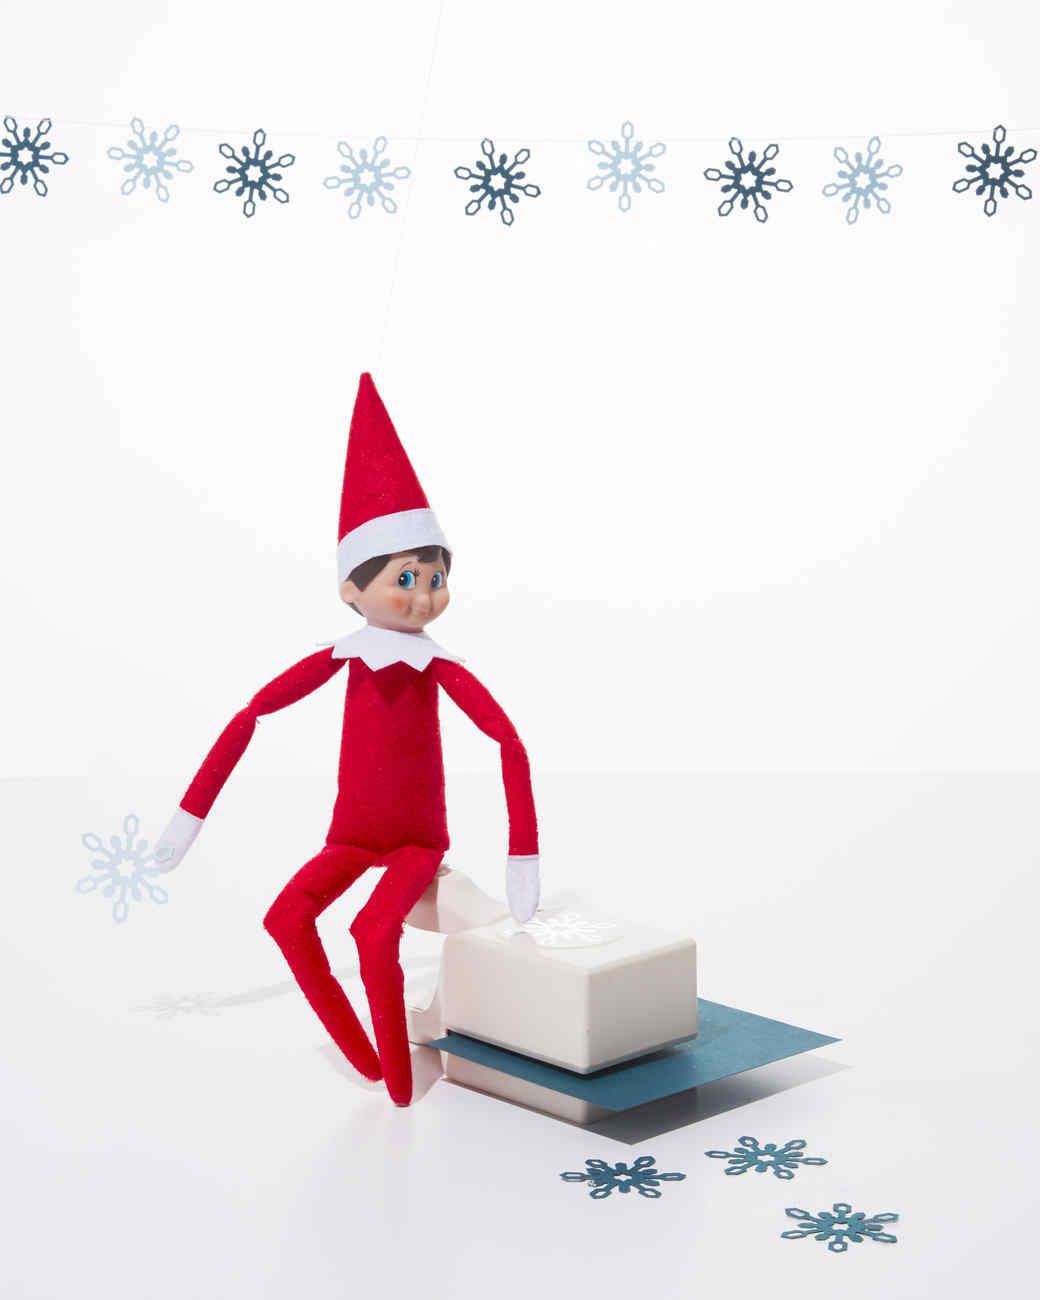 elf-on-shelf-snowflake-0297-d112640-1215.jpg